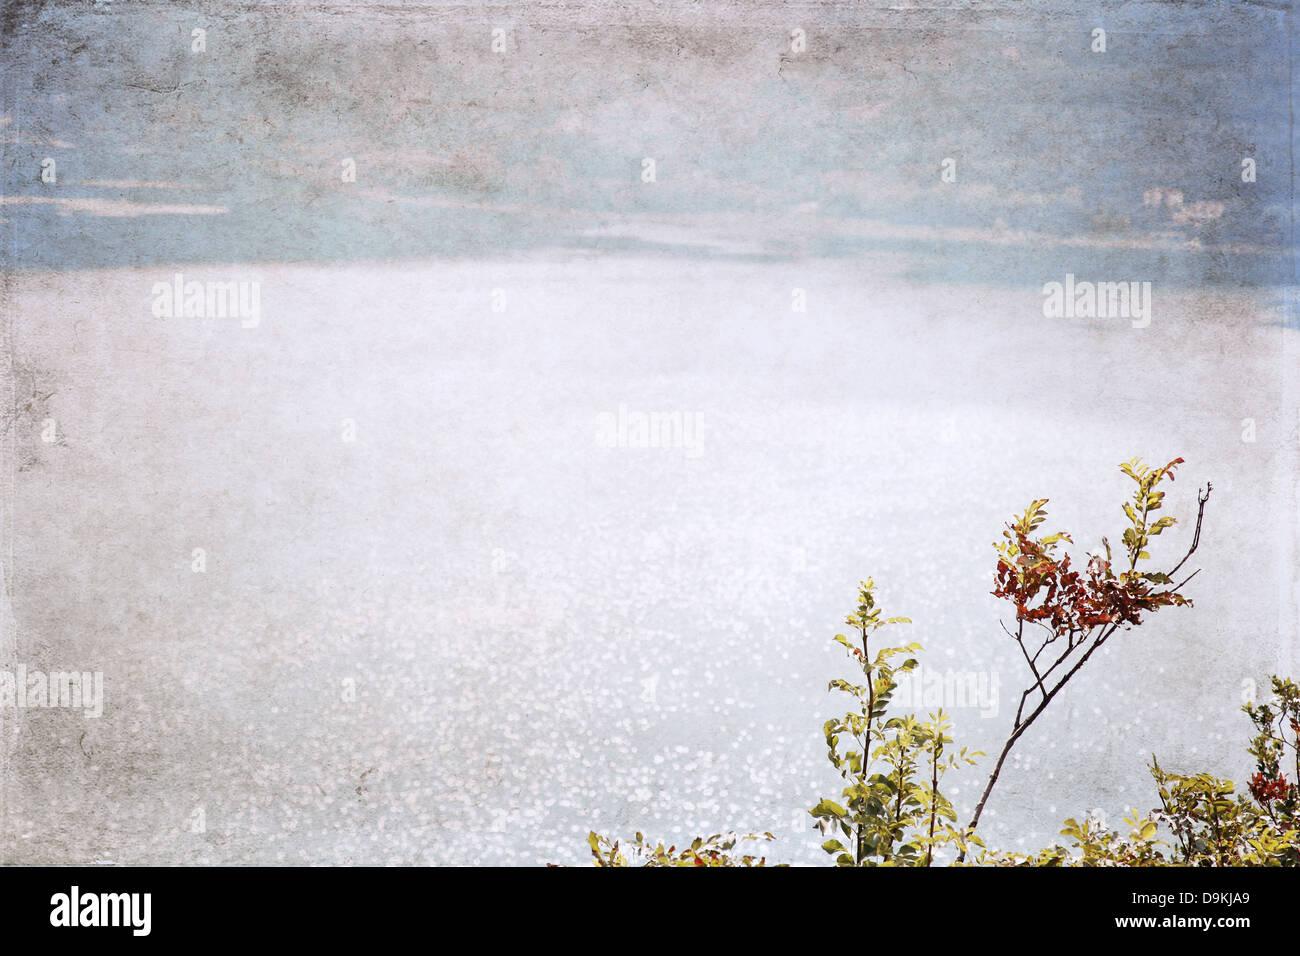 image in grunge style, lake Stock Photo